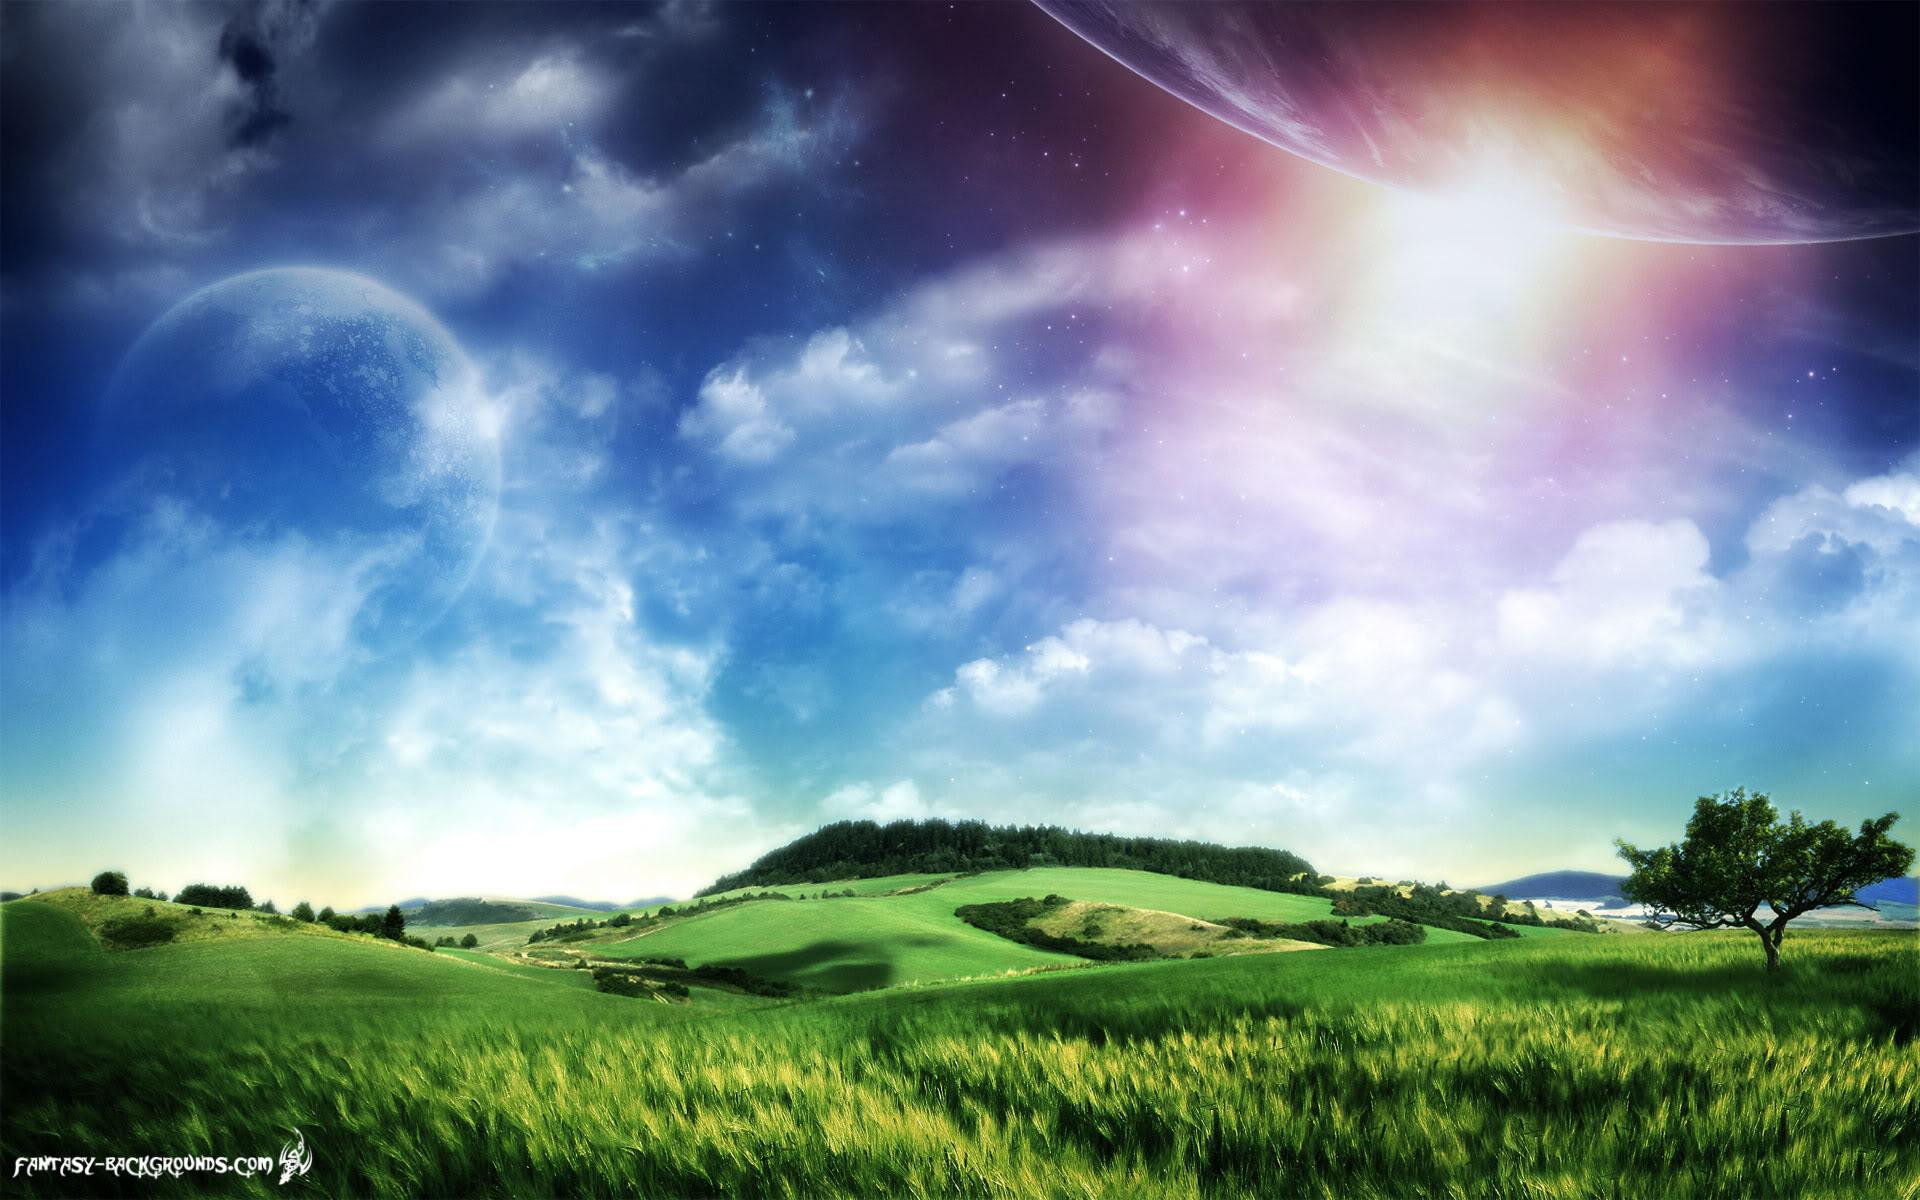 Sci-fi Meadow and Sky Wallpaper